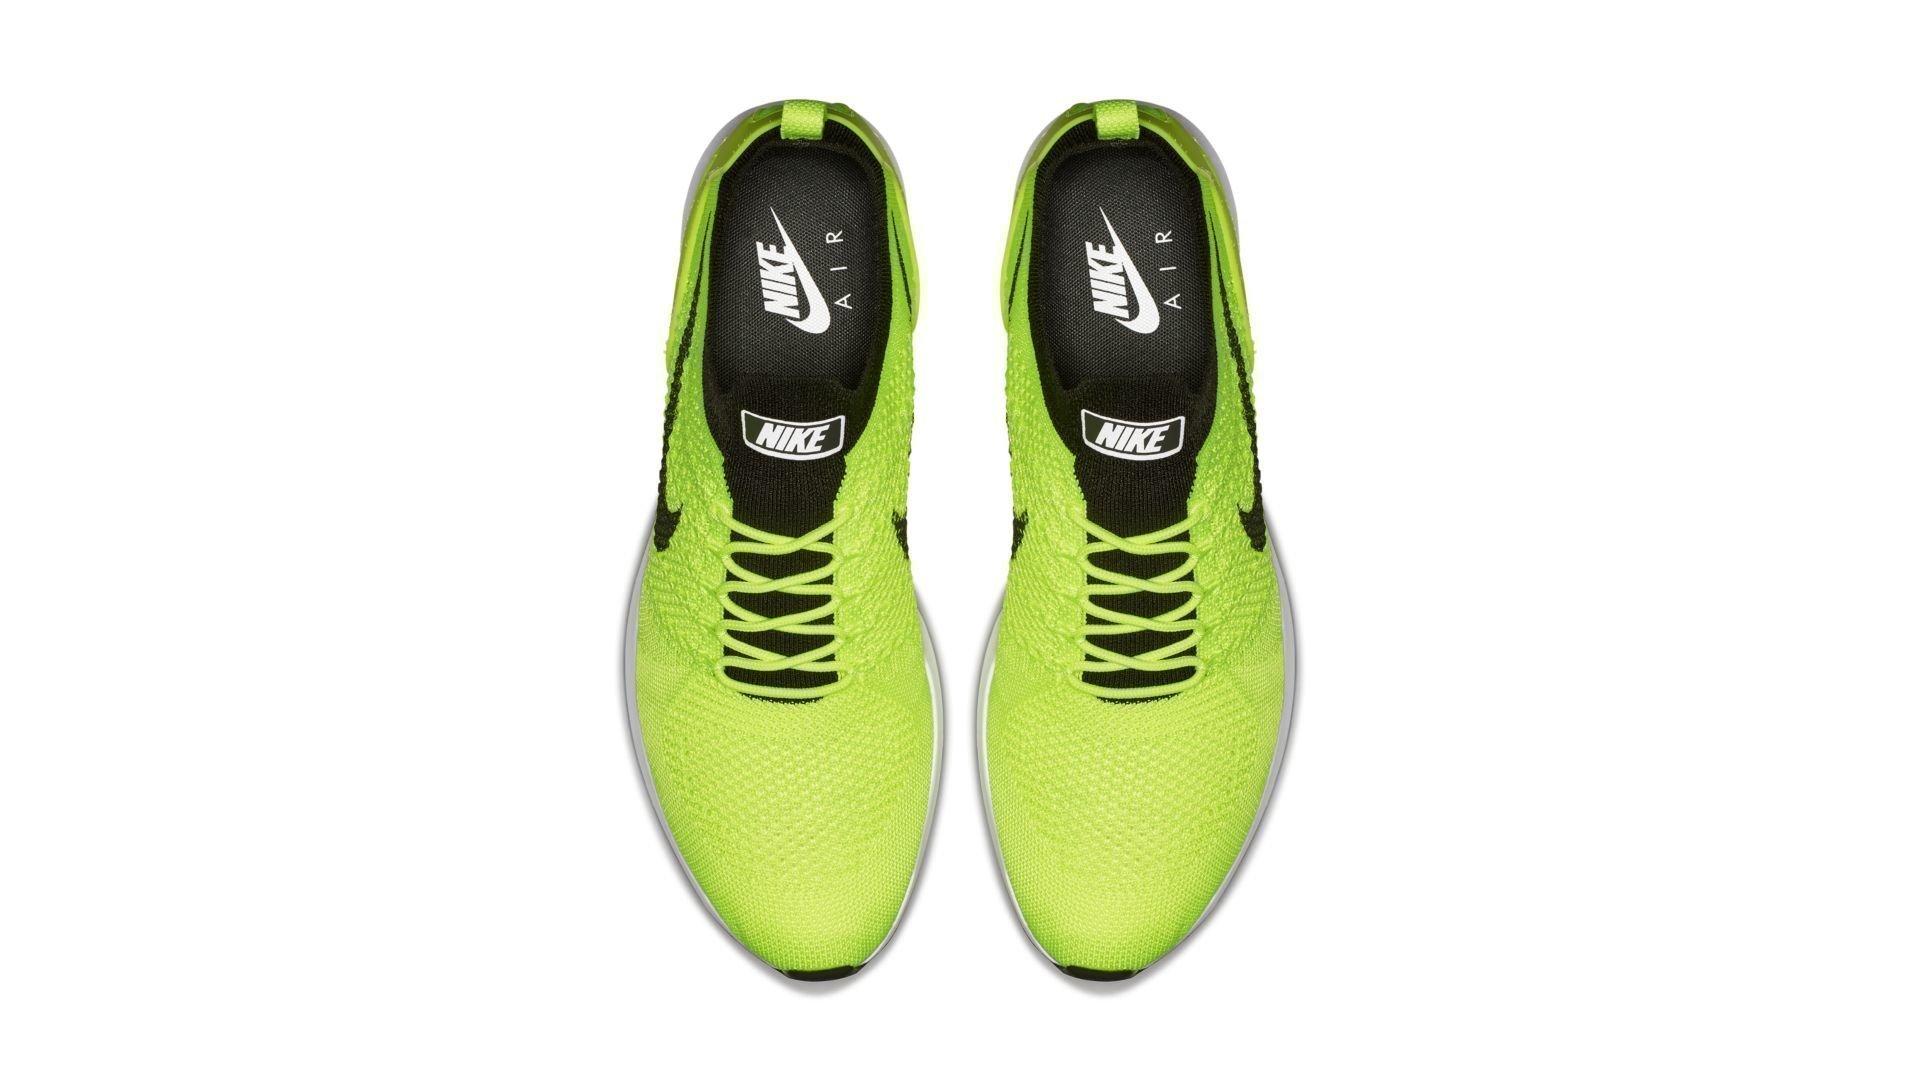 Nike Mariah Flyknit Racer Volt Sequoia (918264-700)